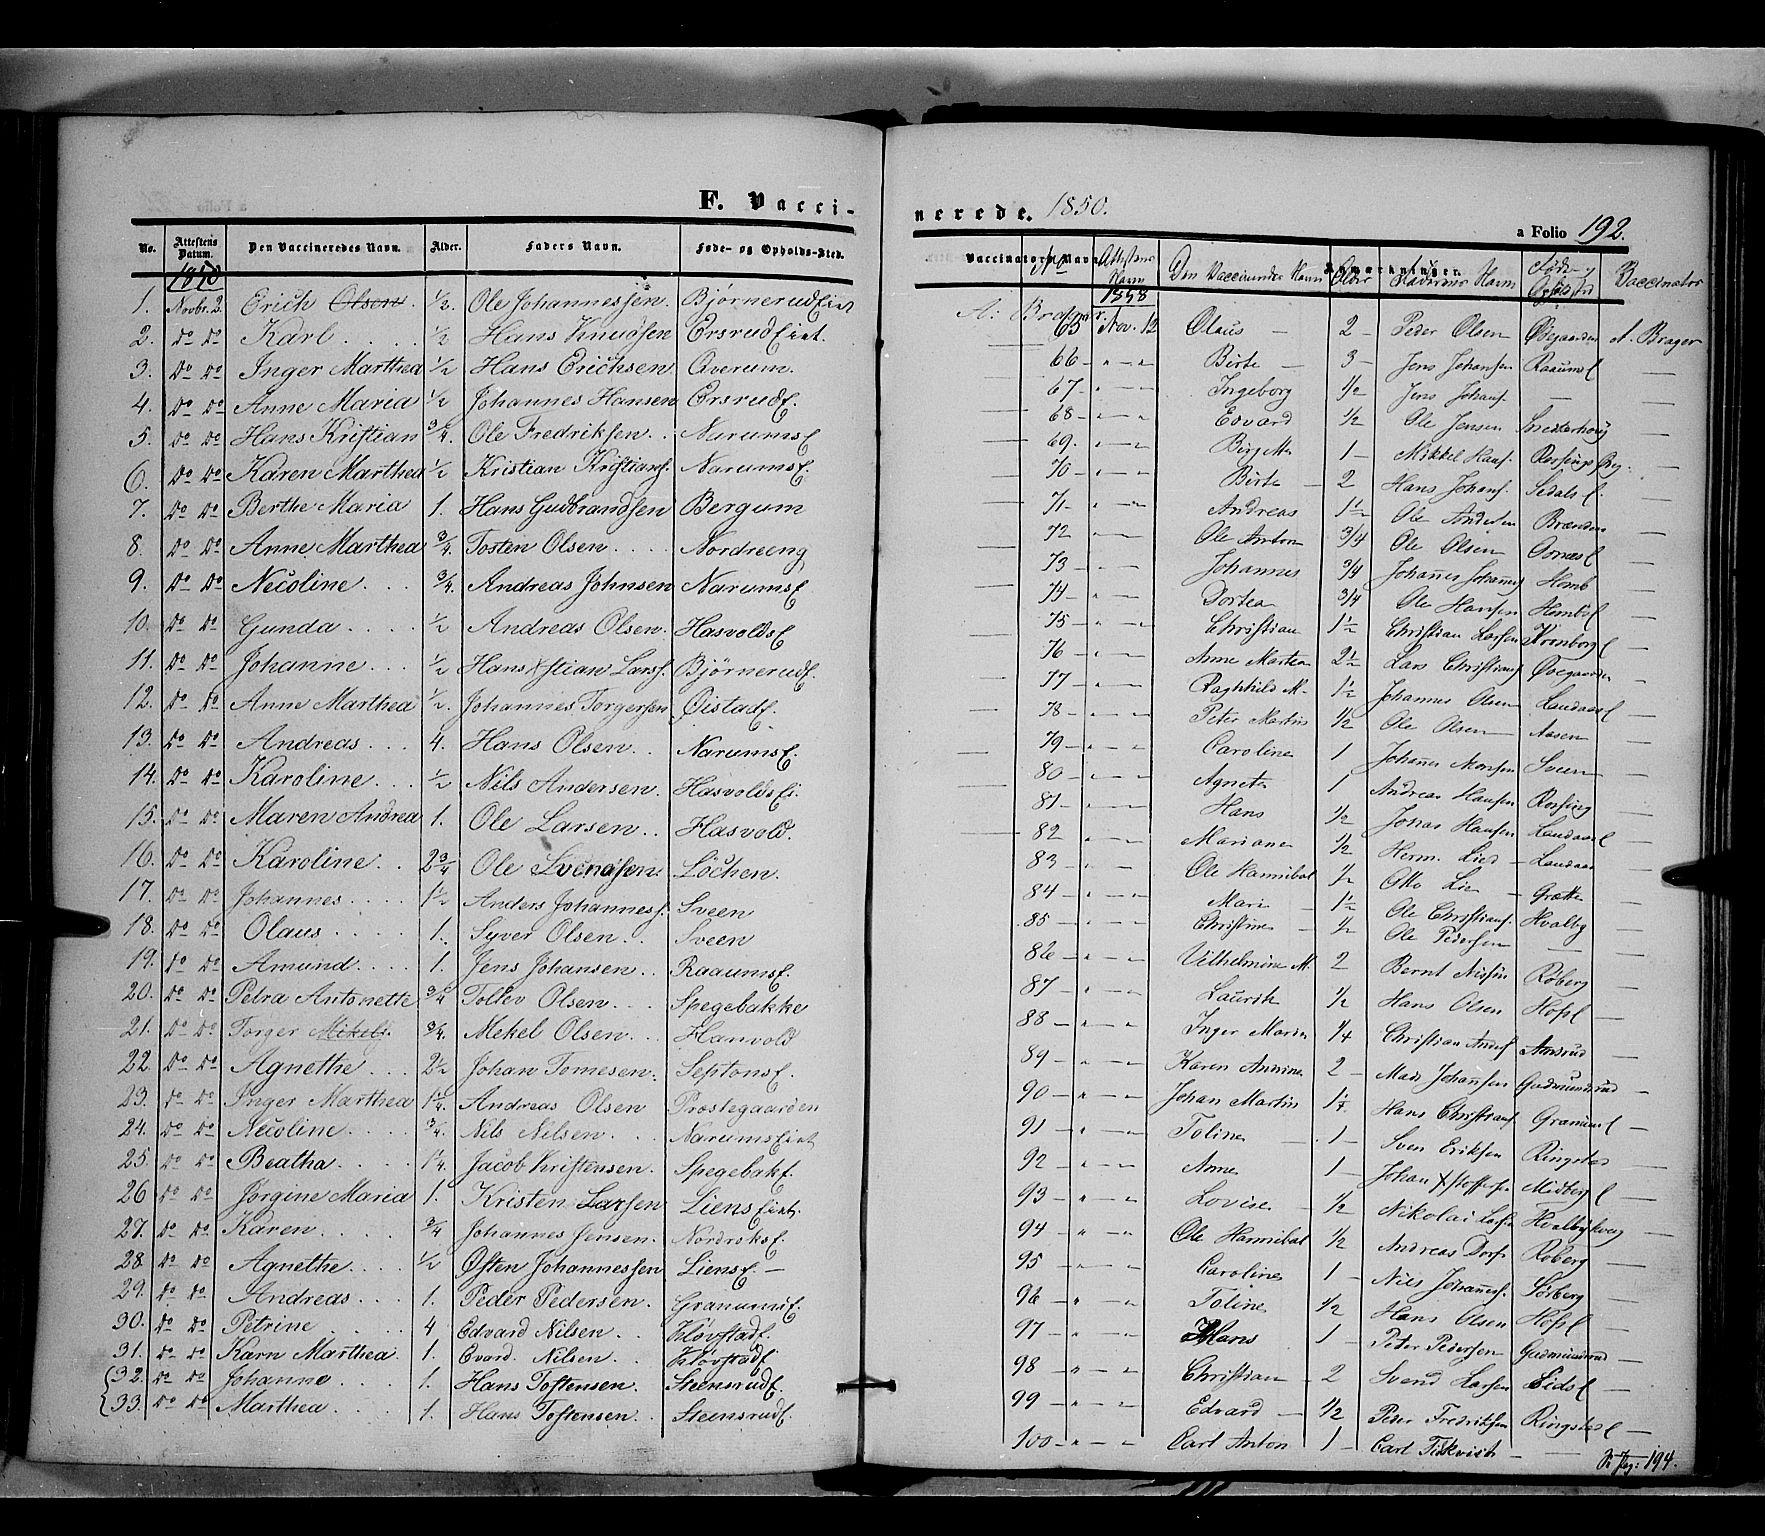 SAH, Land prestekontor, Ministerialbok nr. 9, 1847-1859, s. 192